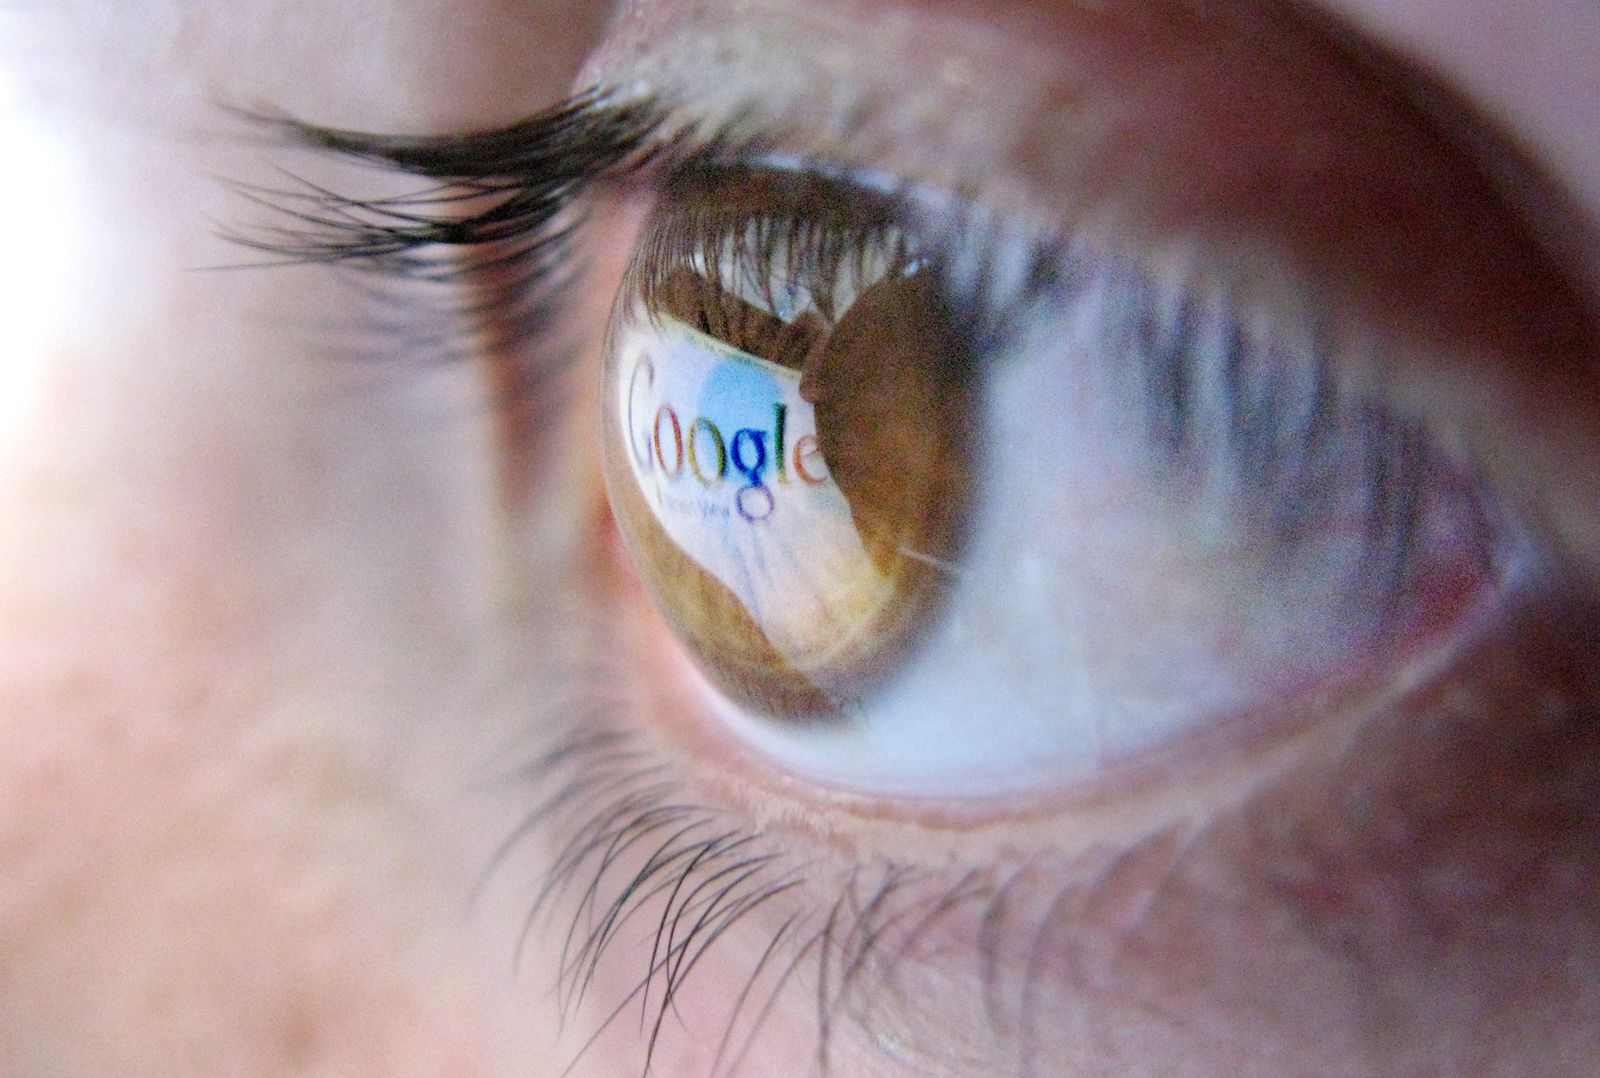 Google im Auge